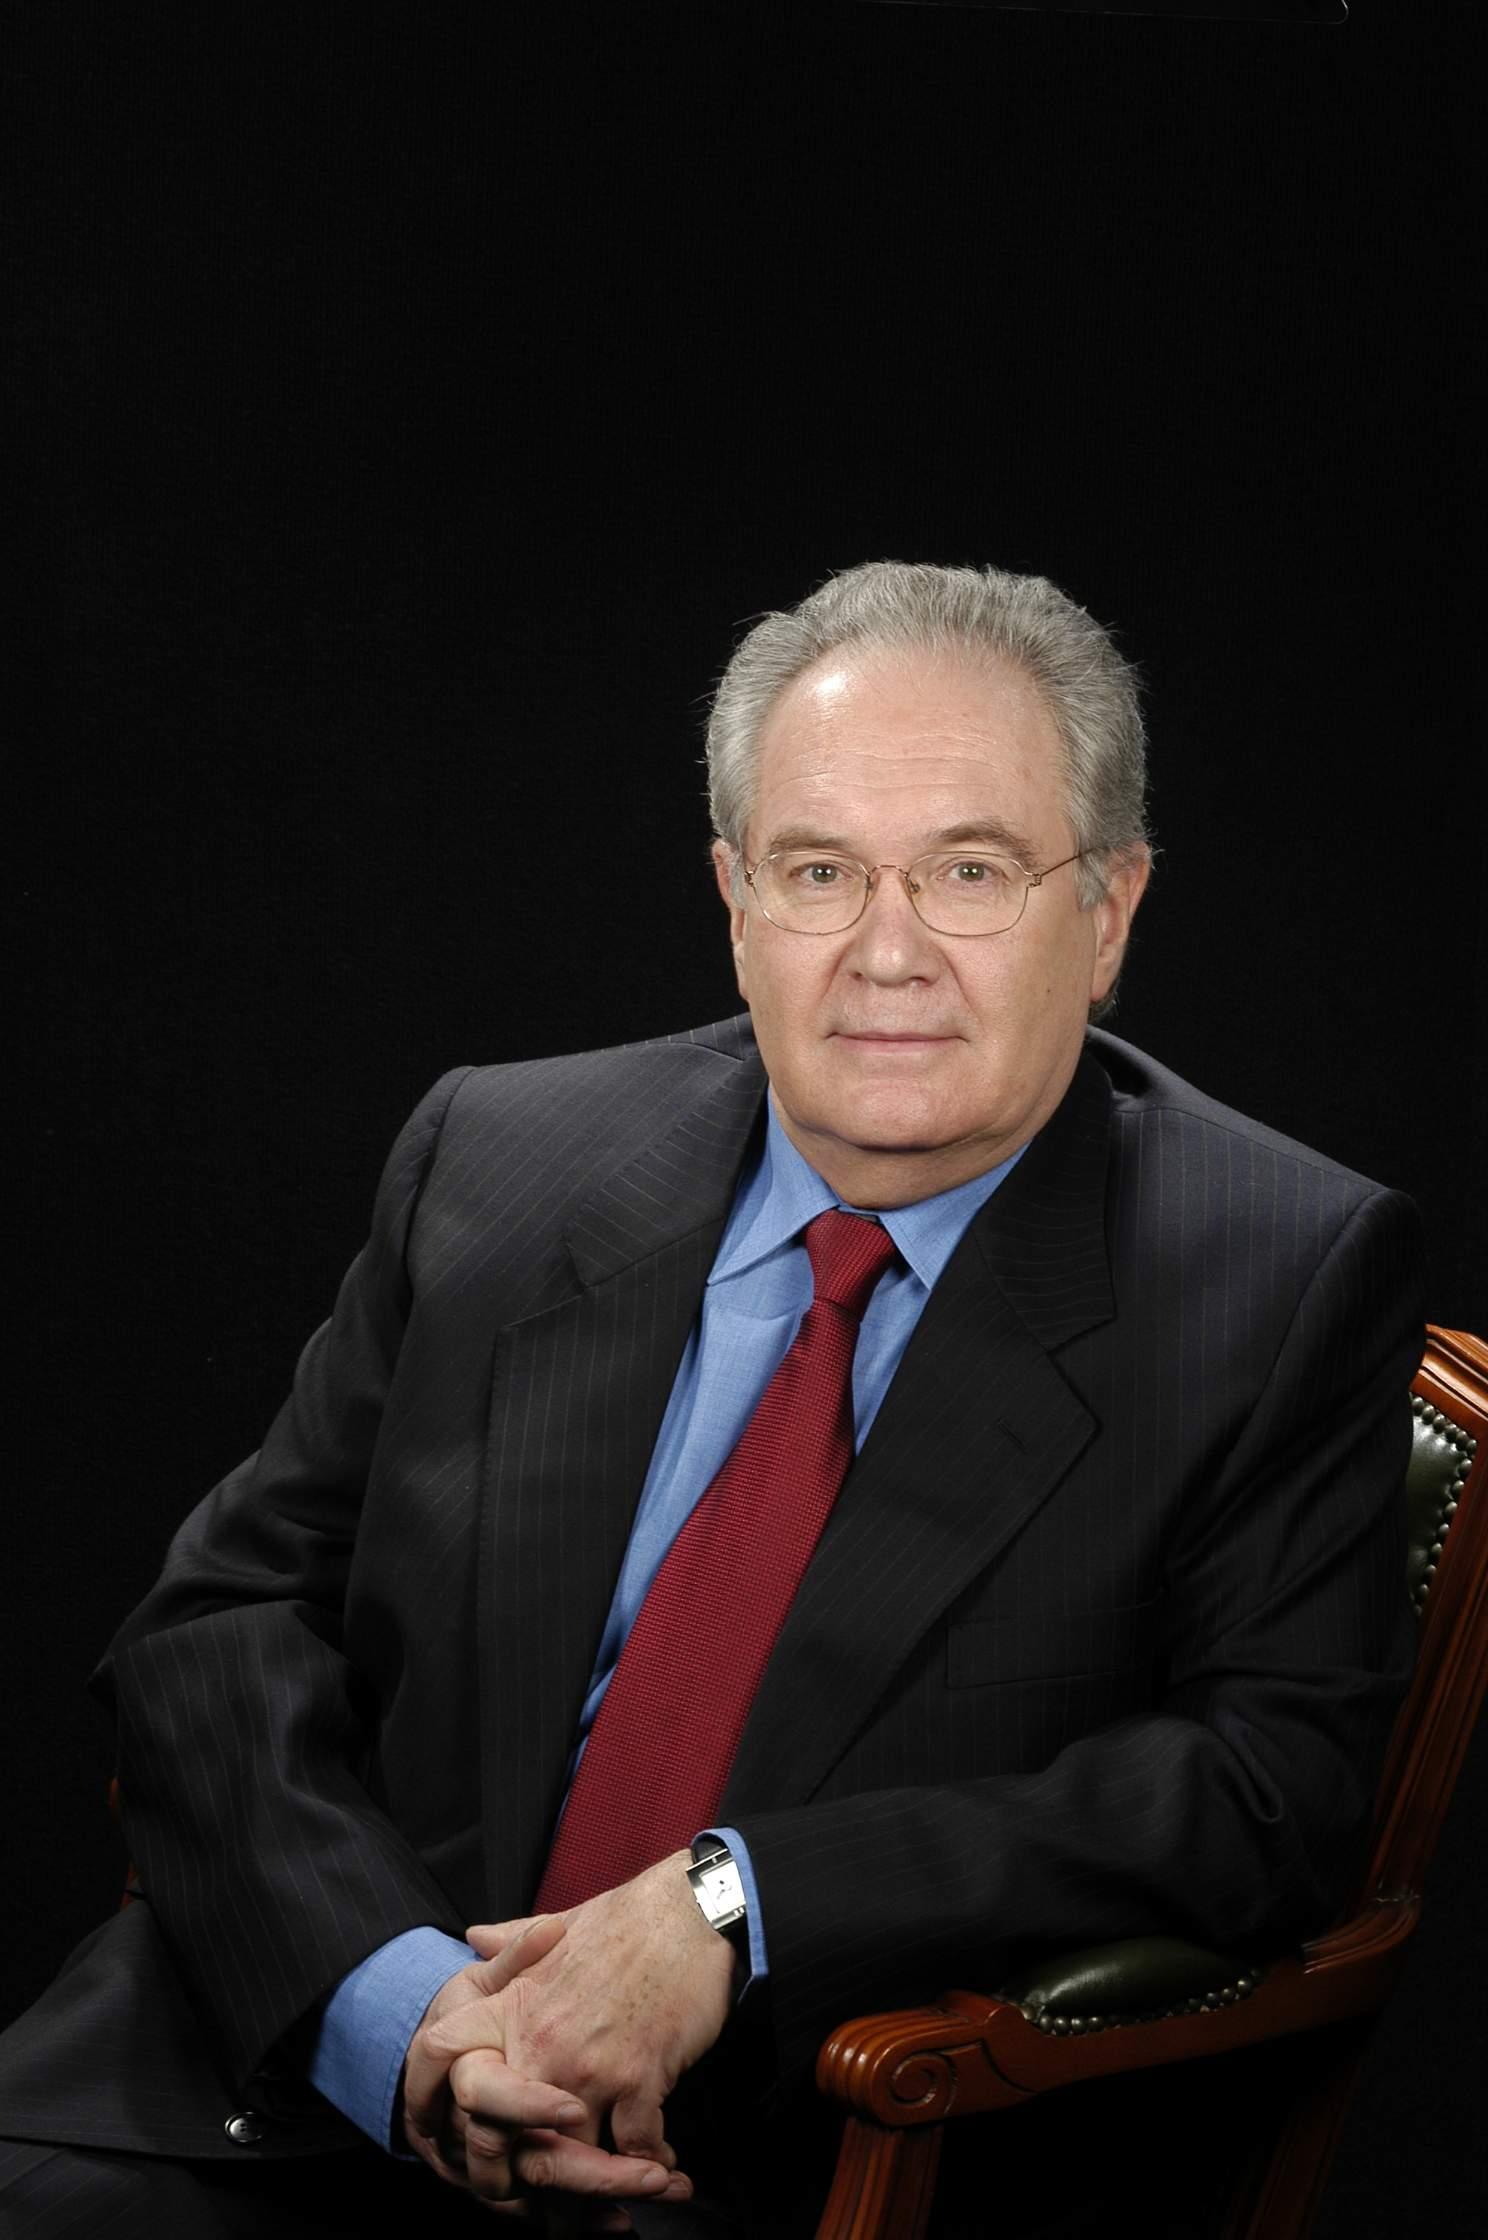 Dr. José Barco Abán